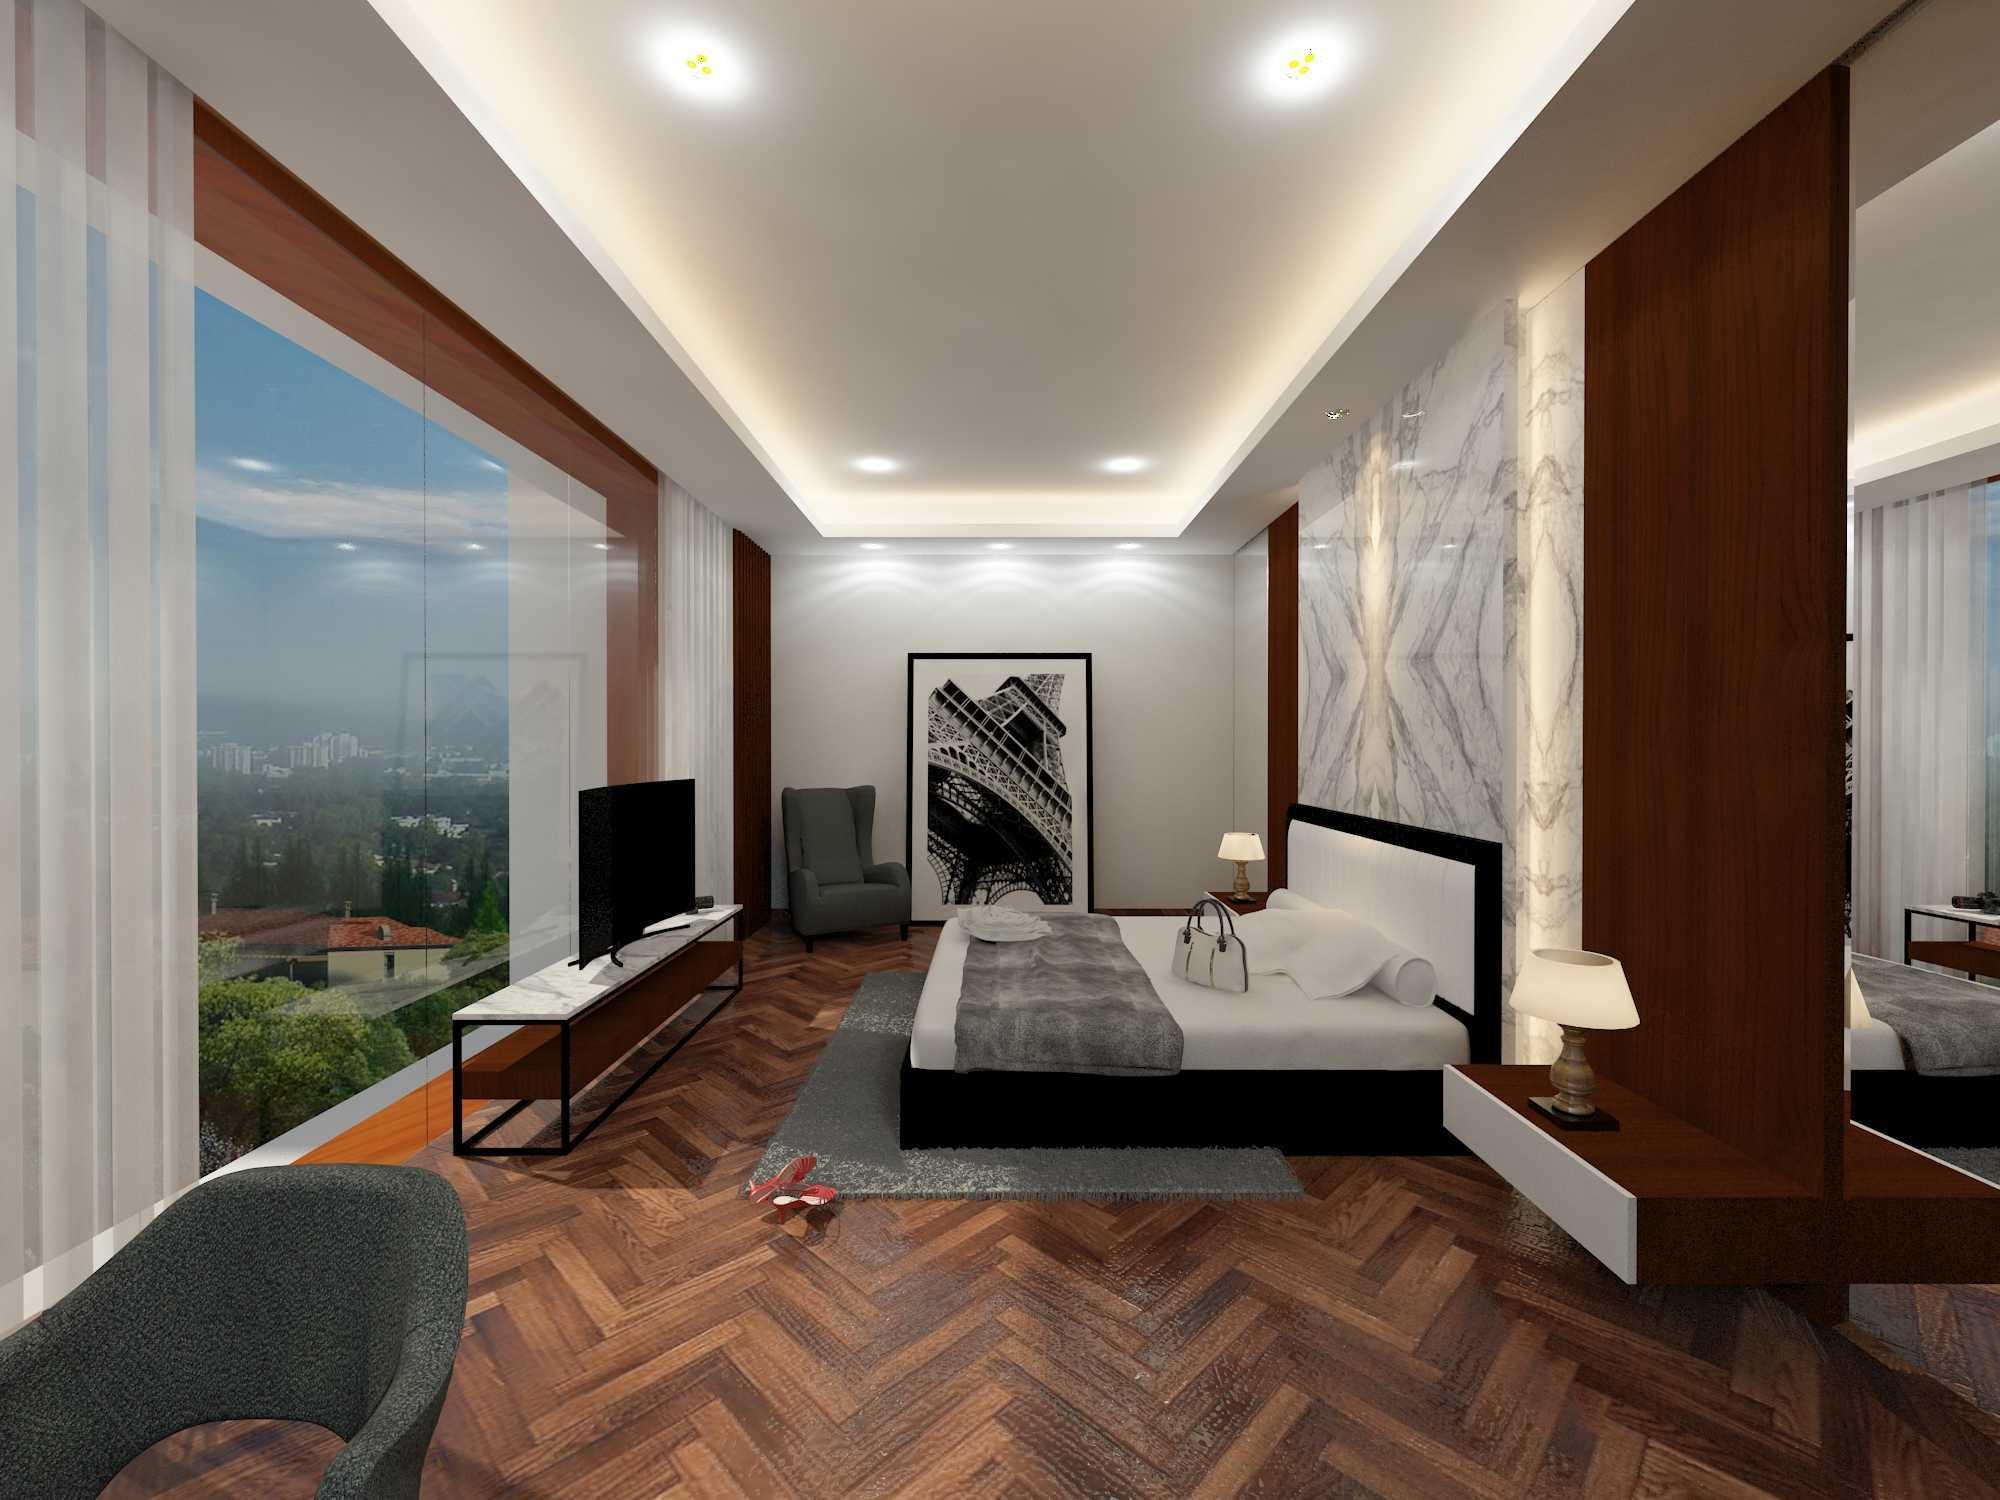 Alima Studio Mr. A's House Jakarta, Indonesia Jakarta, Indonesia Bedroom   27832